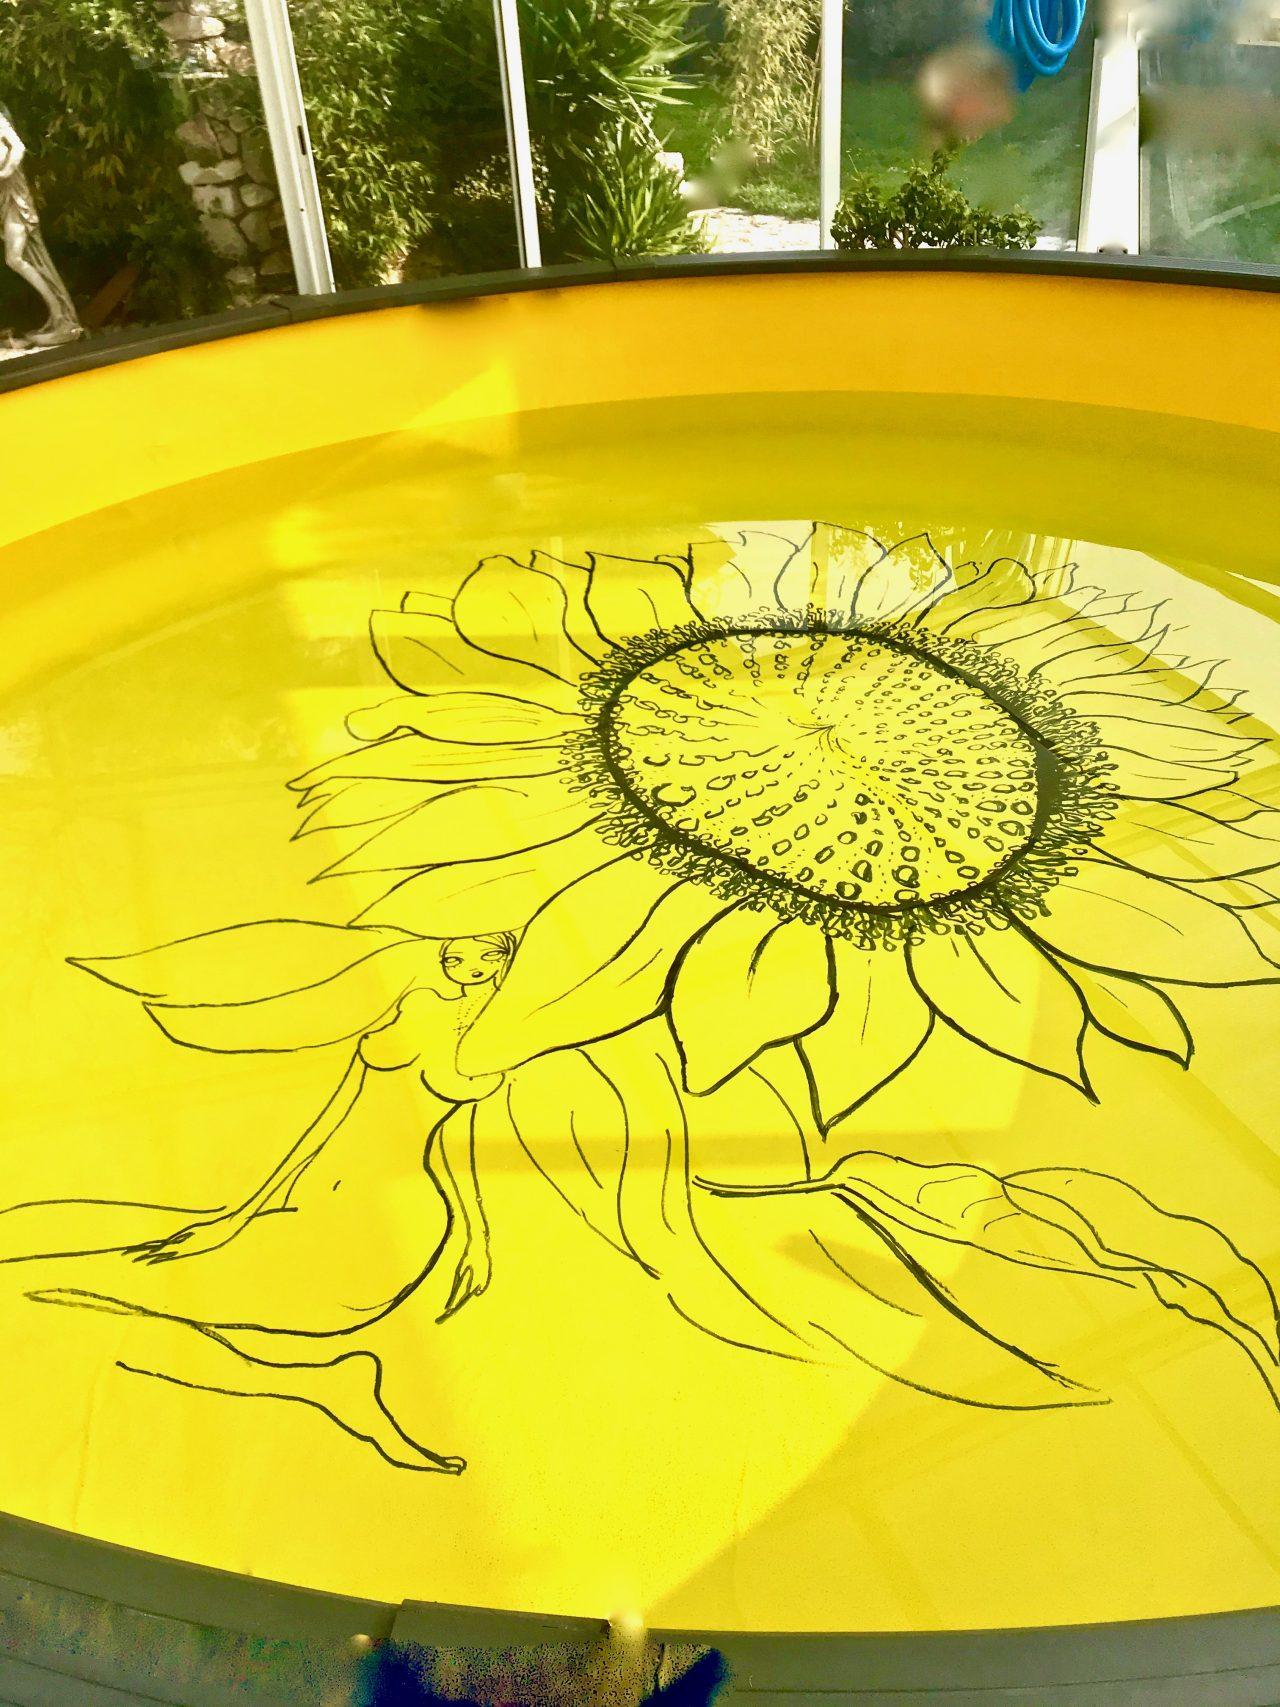 25 Piscine, décor tournesol, Nice, 2020